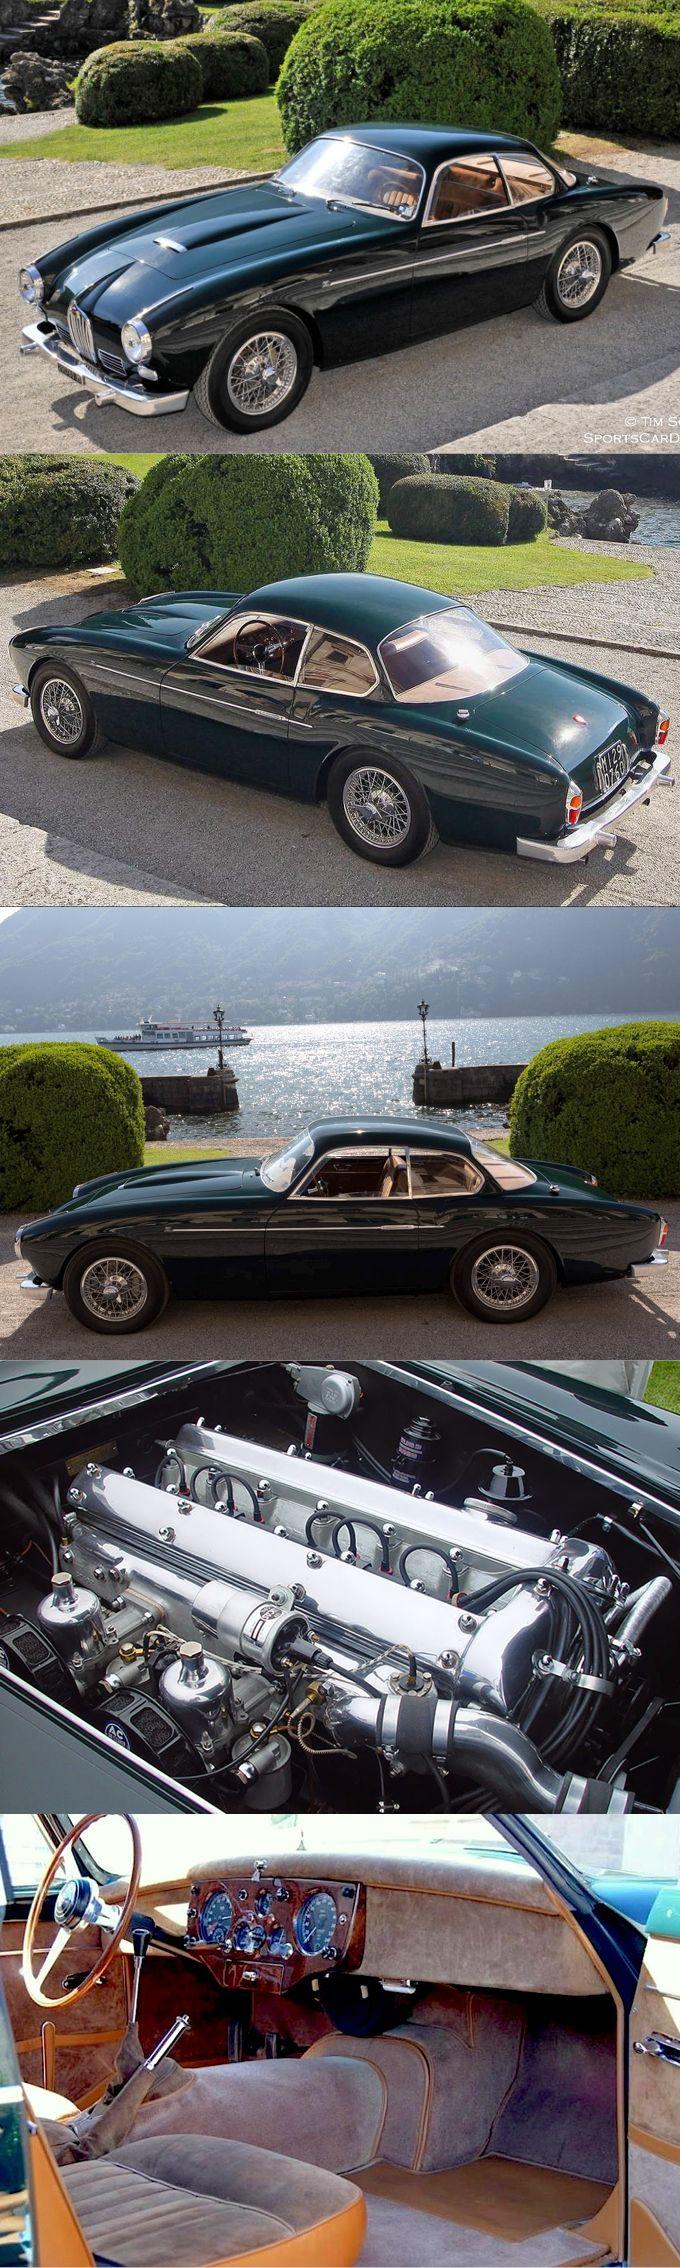 1954 Jaguar XK140 Zagato / 3.4l 190hp L6 / Italy UK / green / 17-362 https://www.amazon.co.uk/Baby-Car-Mirror-Shatterproof-Installation/dp/B06XHG6SSY/ref=sr_1_2?ie=UTF8&qid=1499074433&sr=8-2&keywords=Kingseye